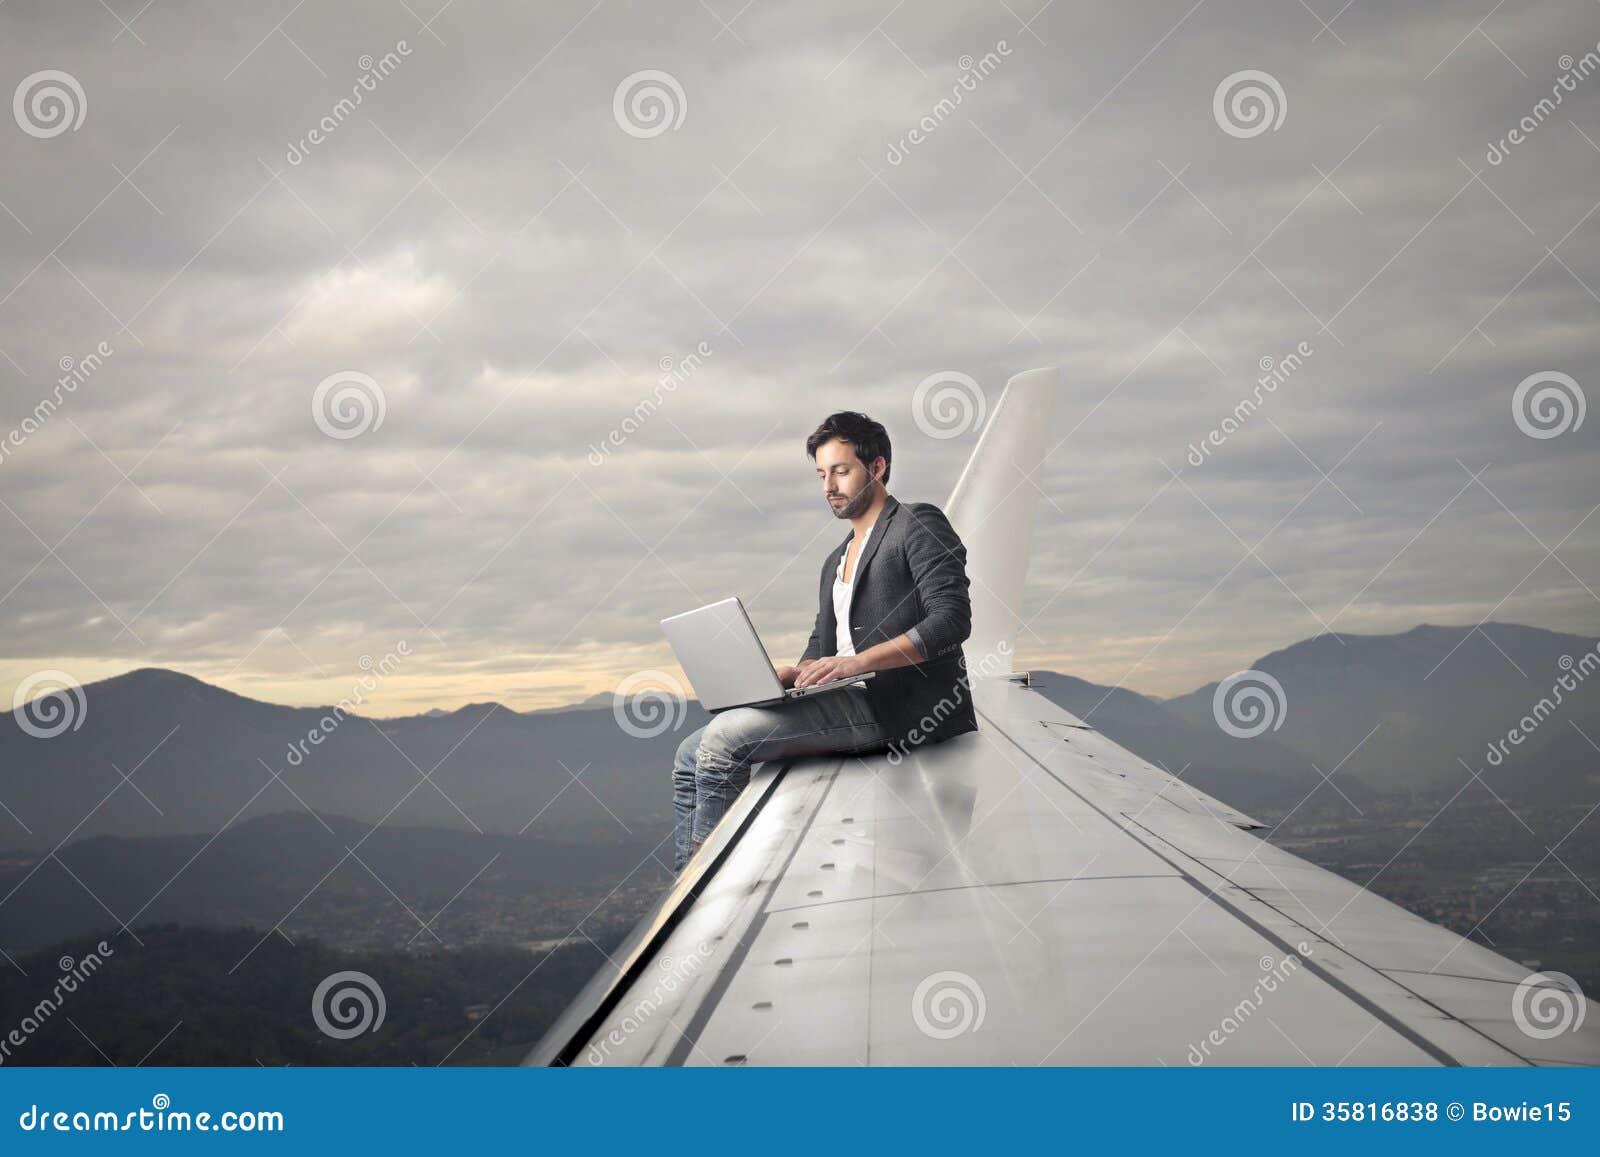 Man Working On His Laptop Royalty Free Stock Photos